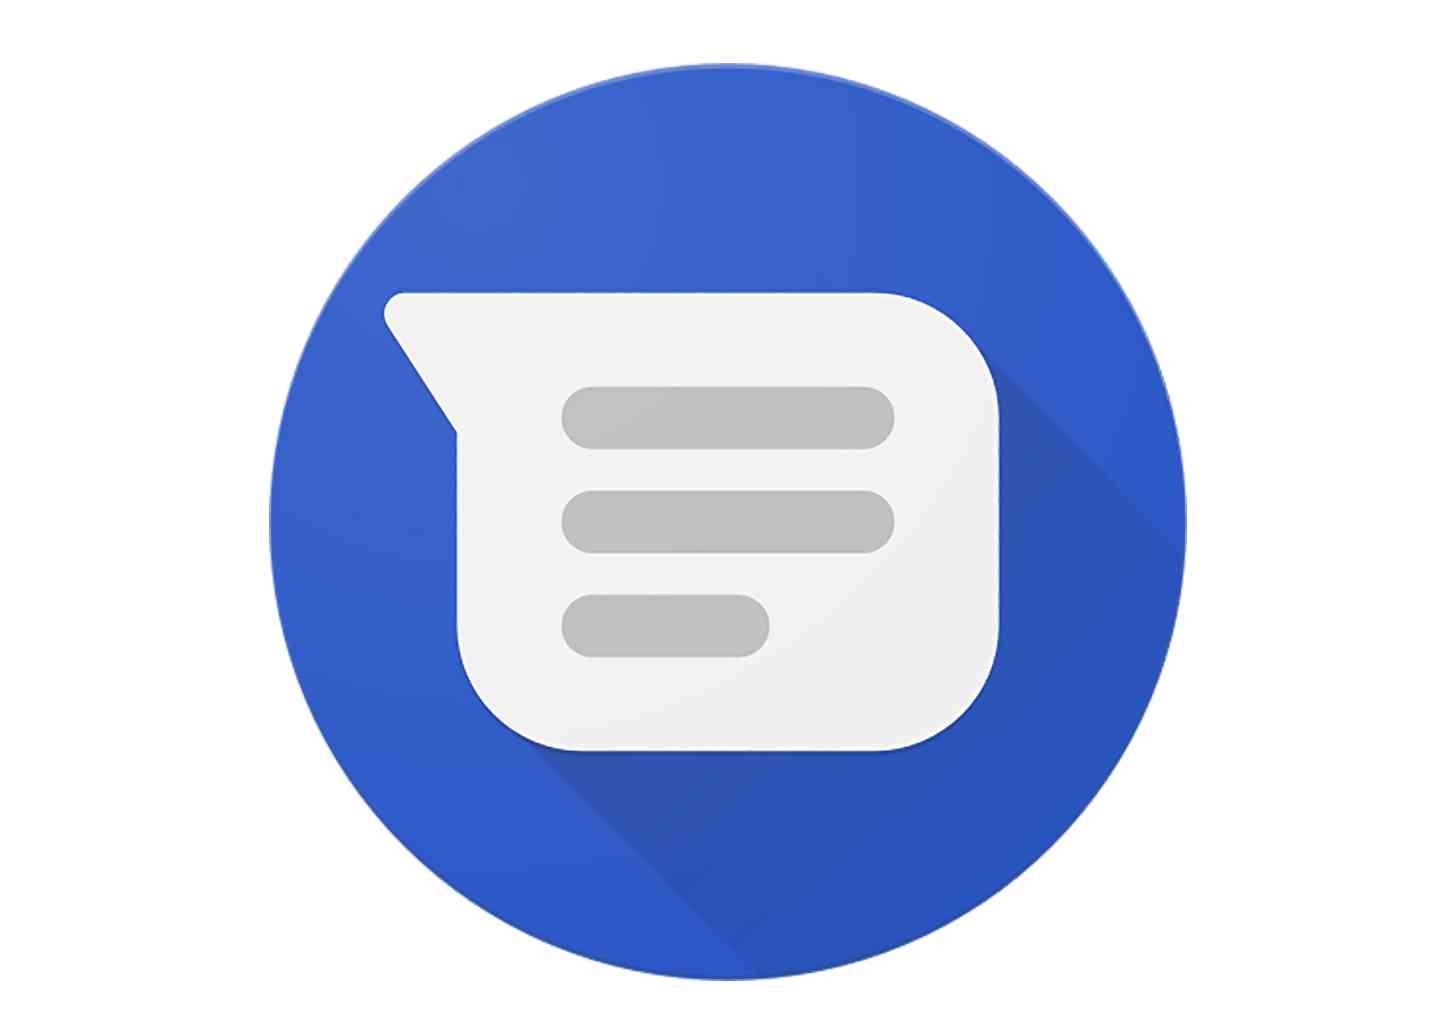 android messages i231in webde mesajlaşma d246nemi geliyor